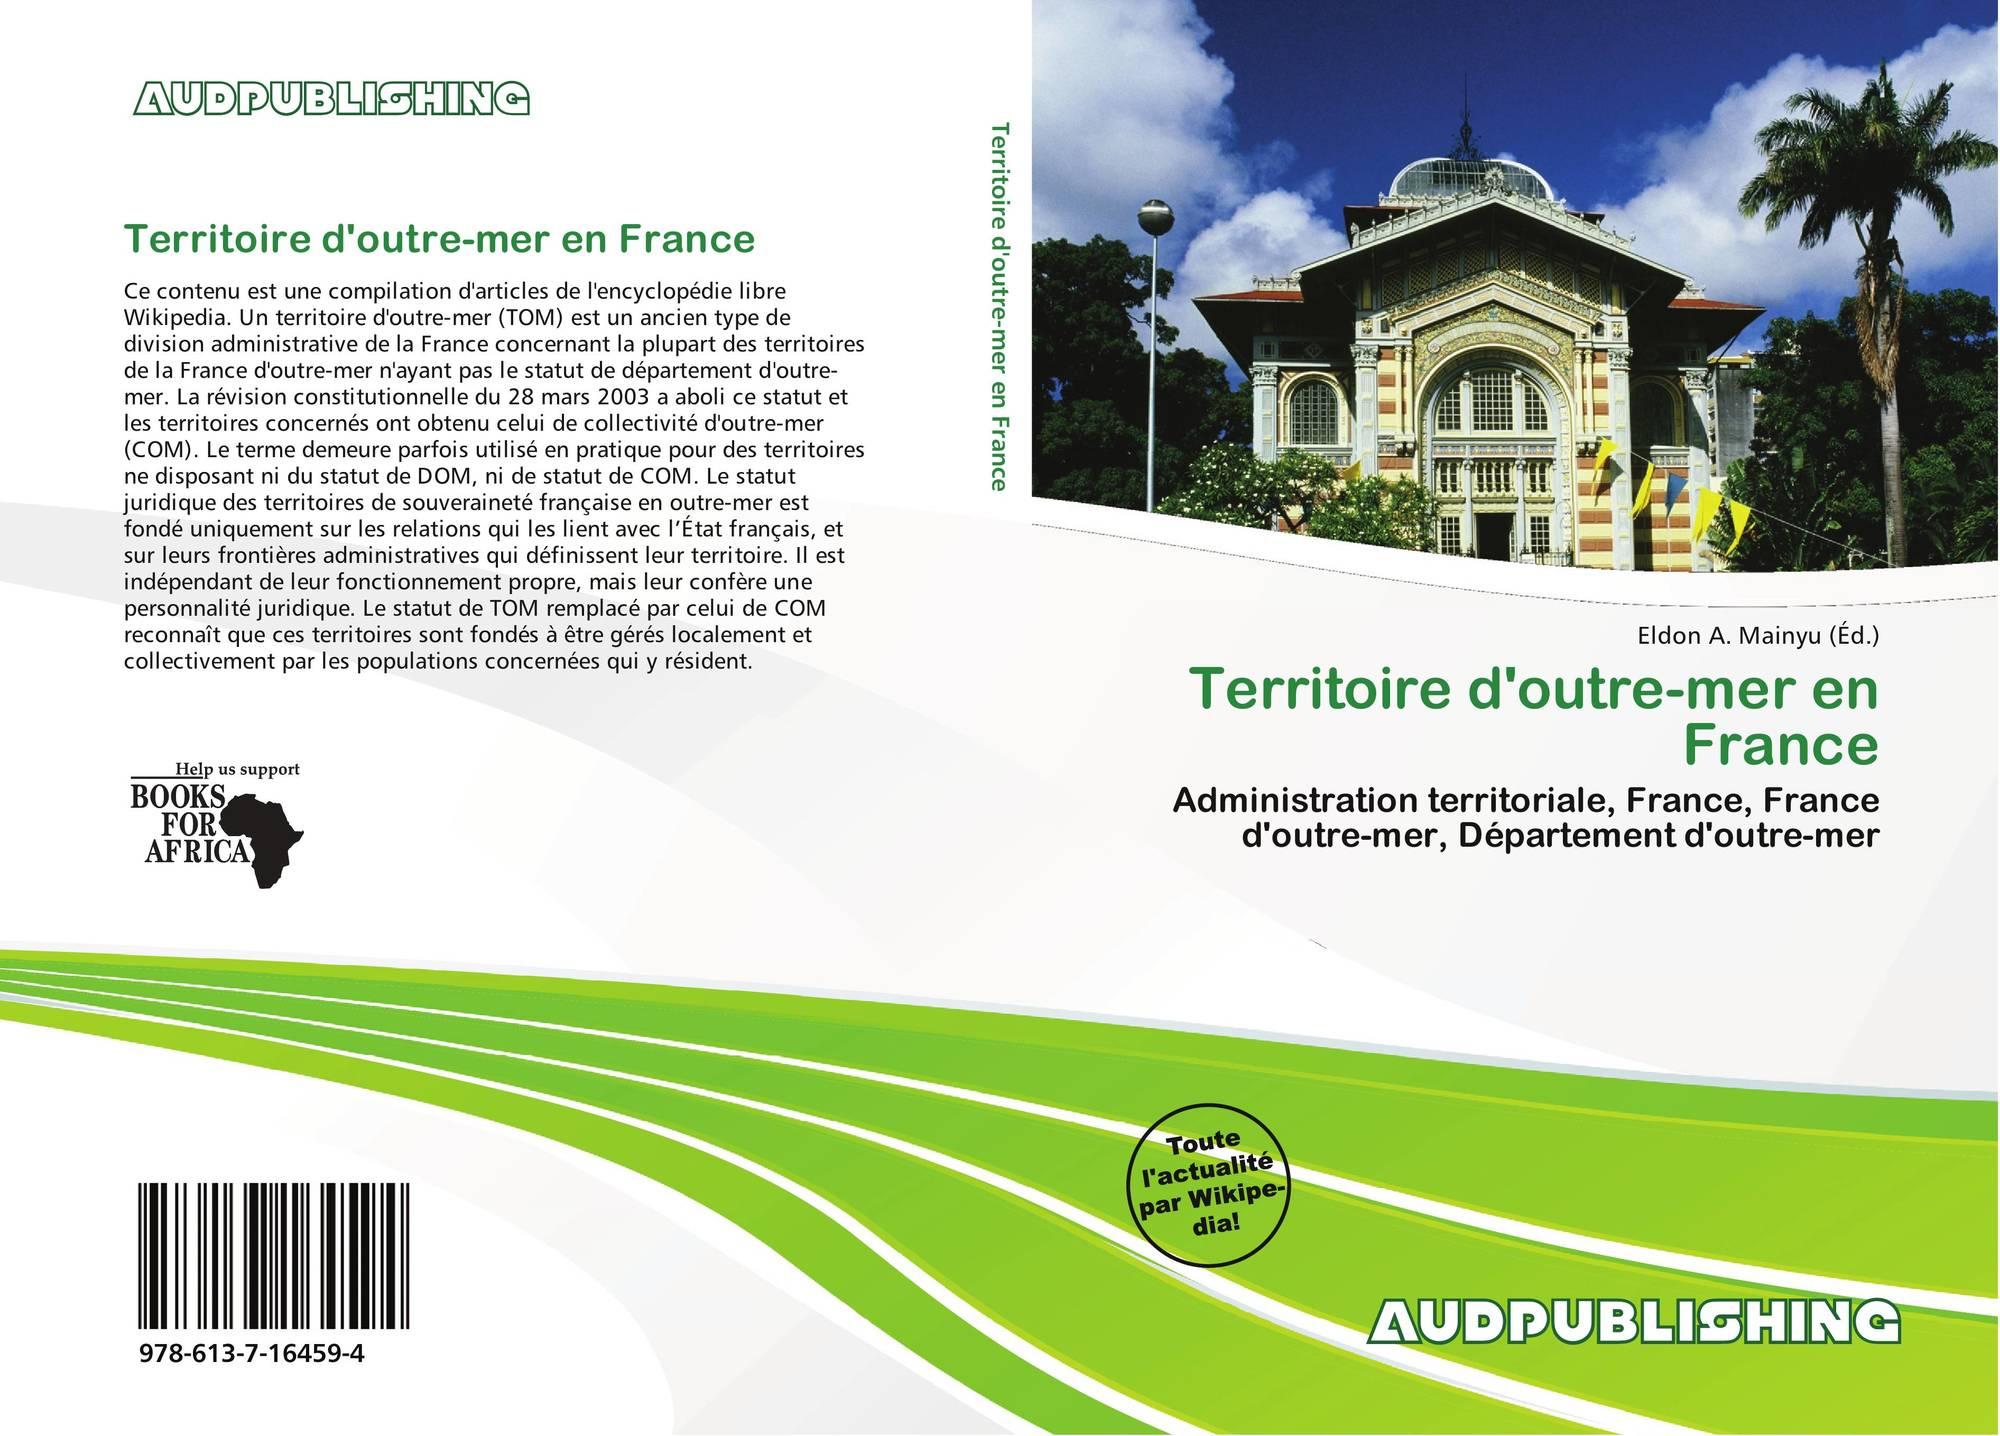 Territoire D'outre-Mer En France, 978-613-7-16459-4 concernant France Territoires D Outre Mer